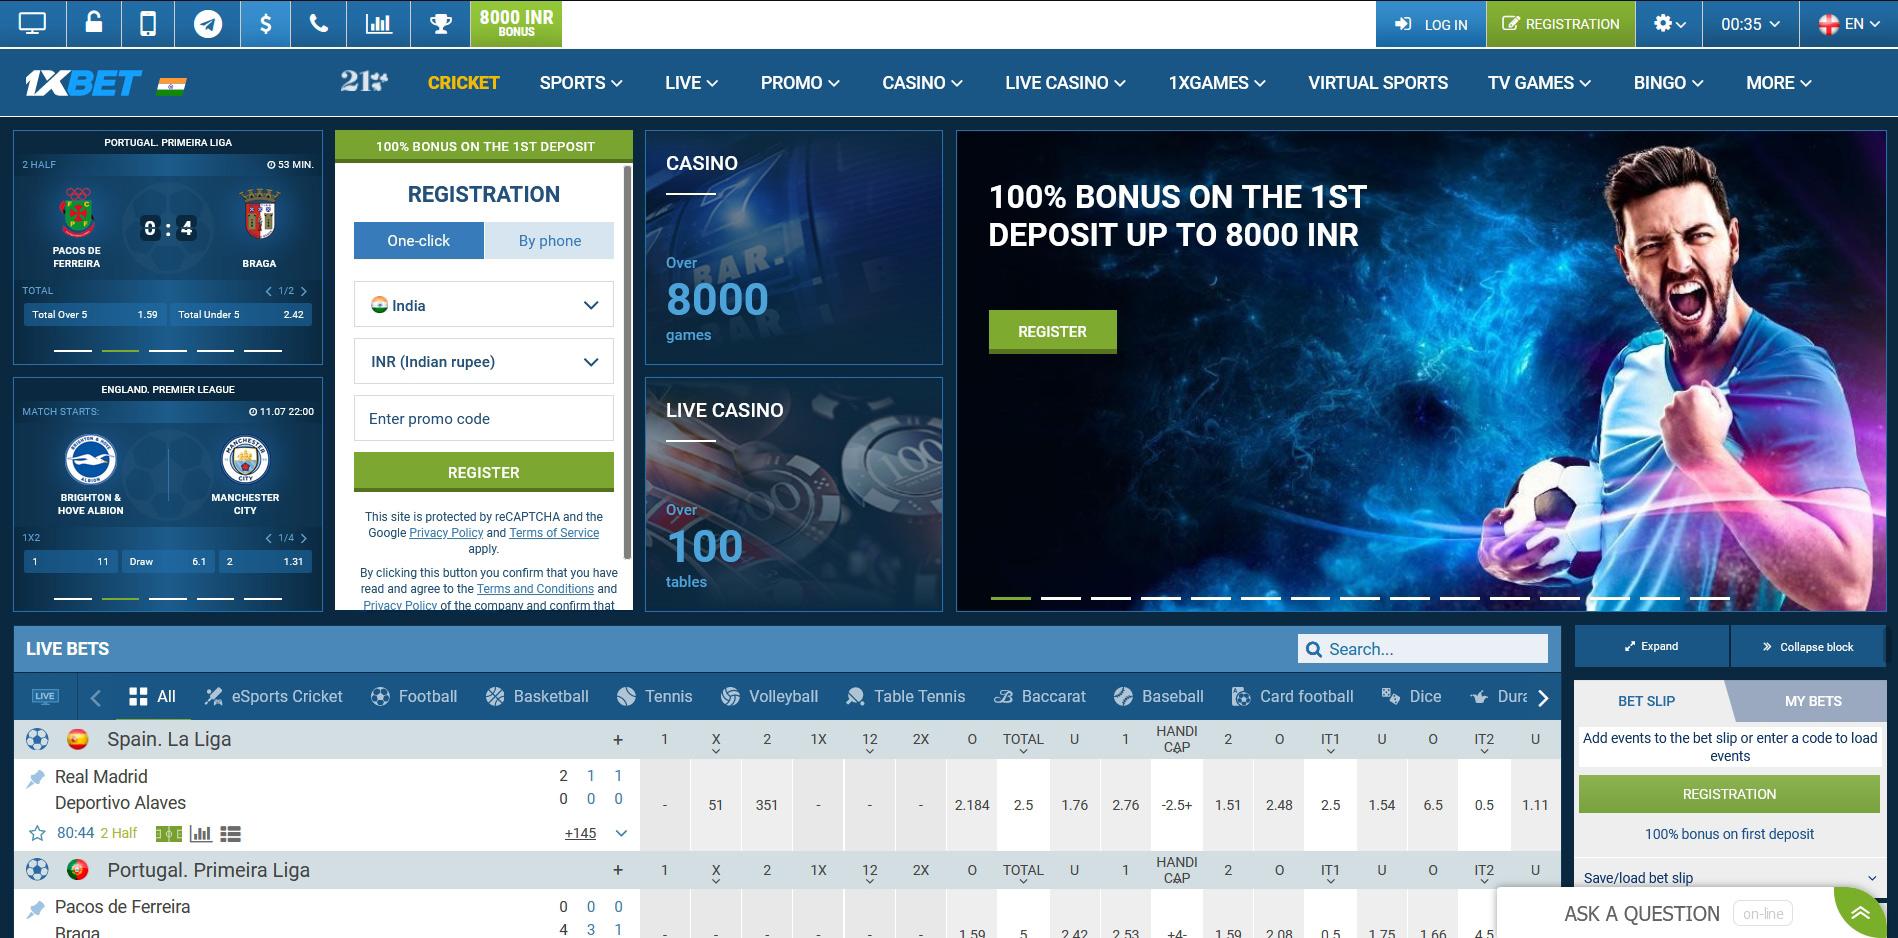 Official website of 1xBet bookmaker.